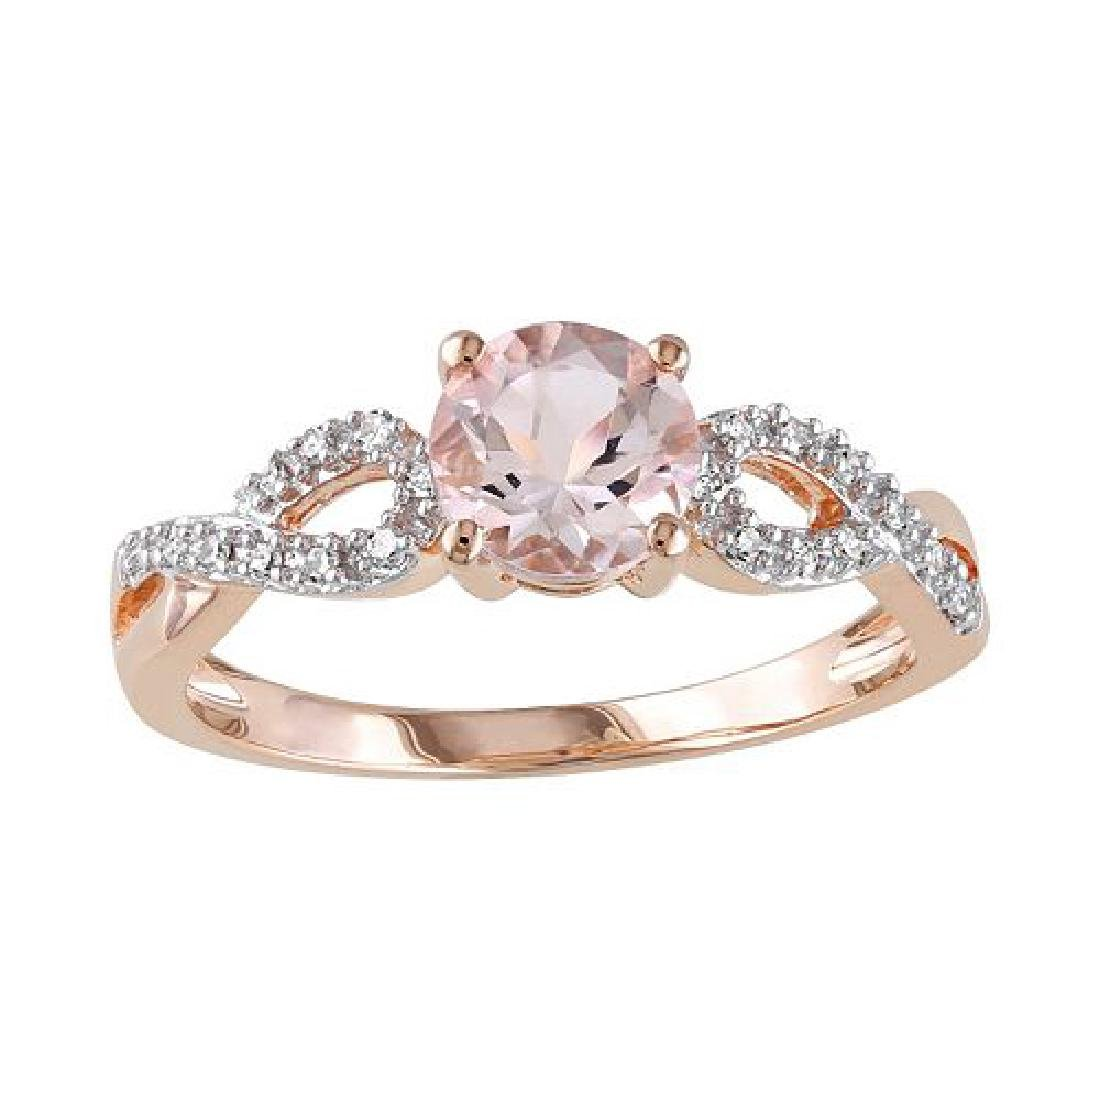 1 ct Morganite and Diamond Ring 10k RG